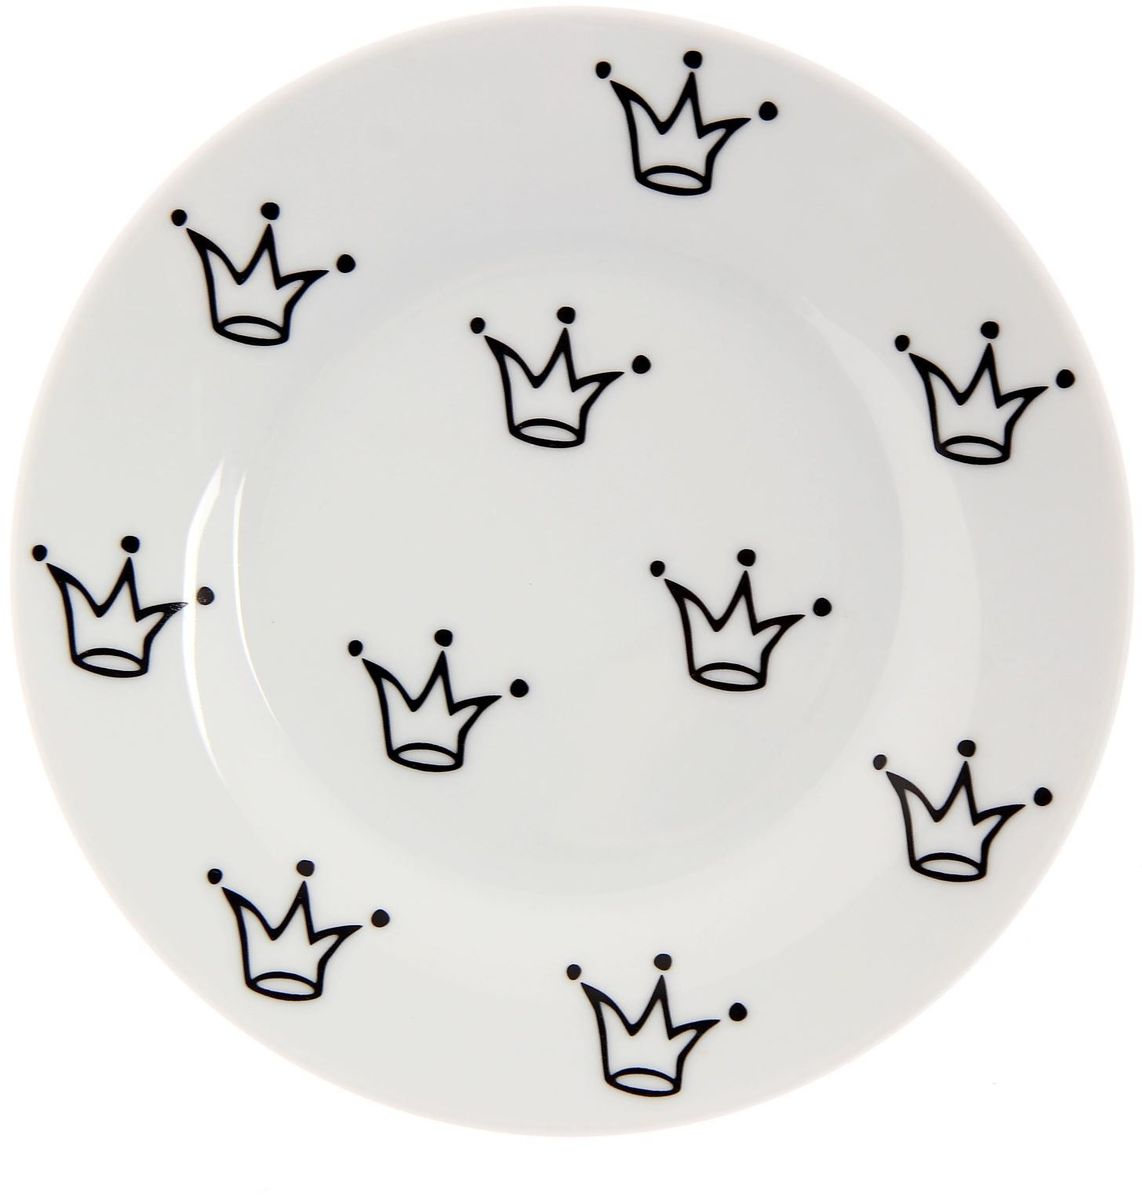 Тарелка мелкая Сотвори чудо My Little Crown, диаметр 15,5 см тарелка мелкая сотвори чудо полярный мишка диаметр 20 см